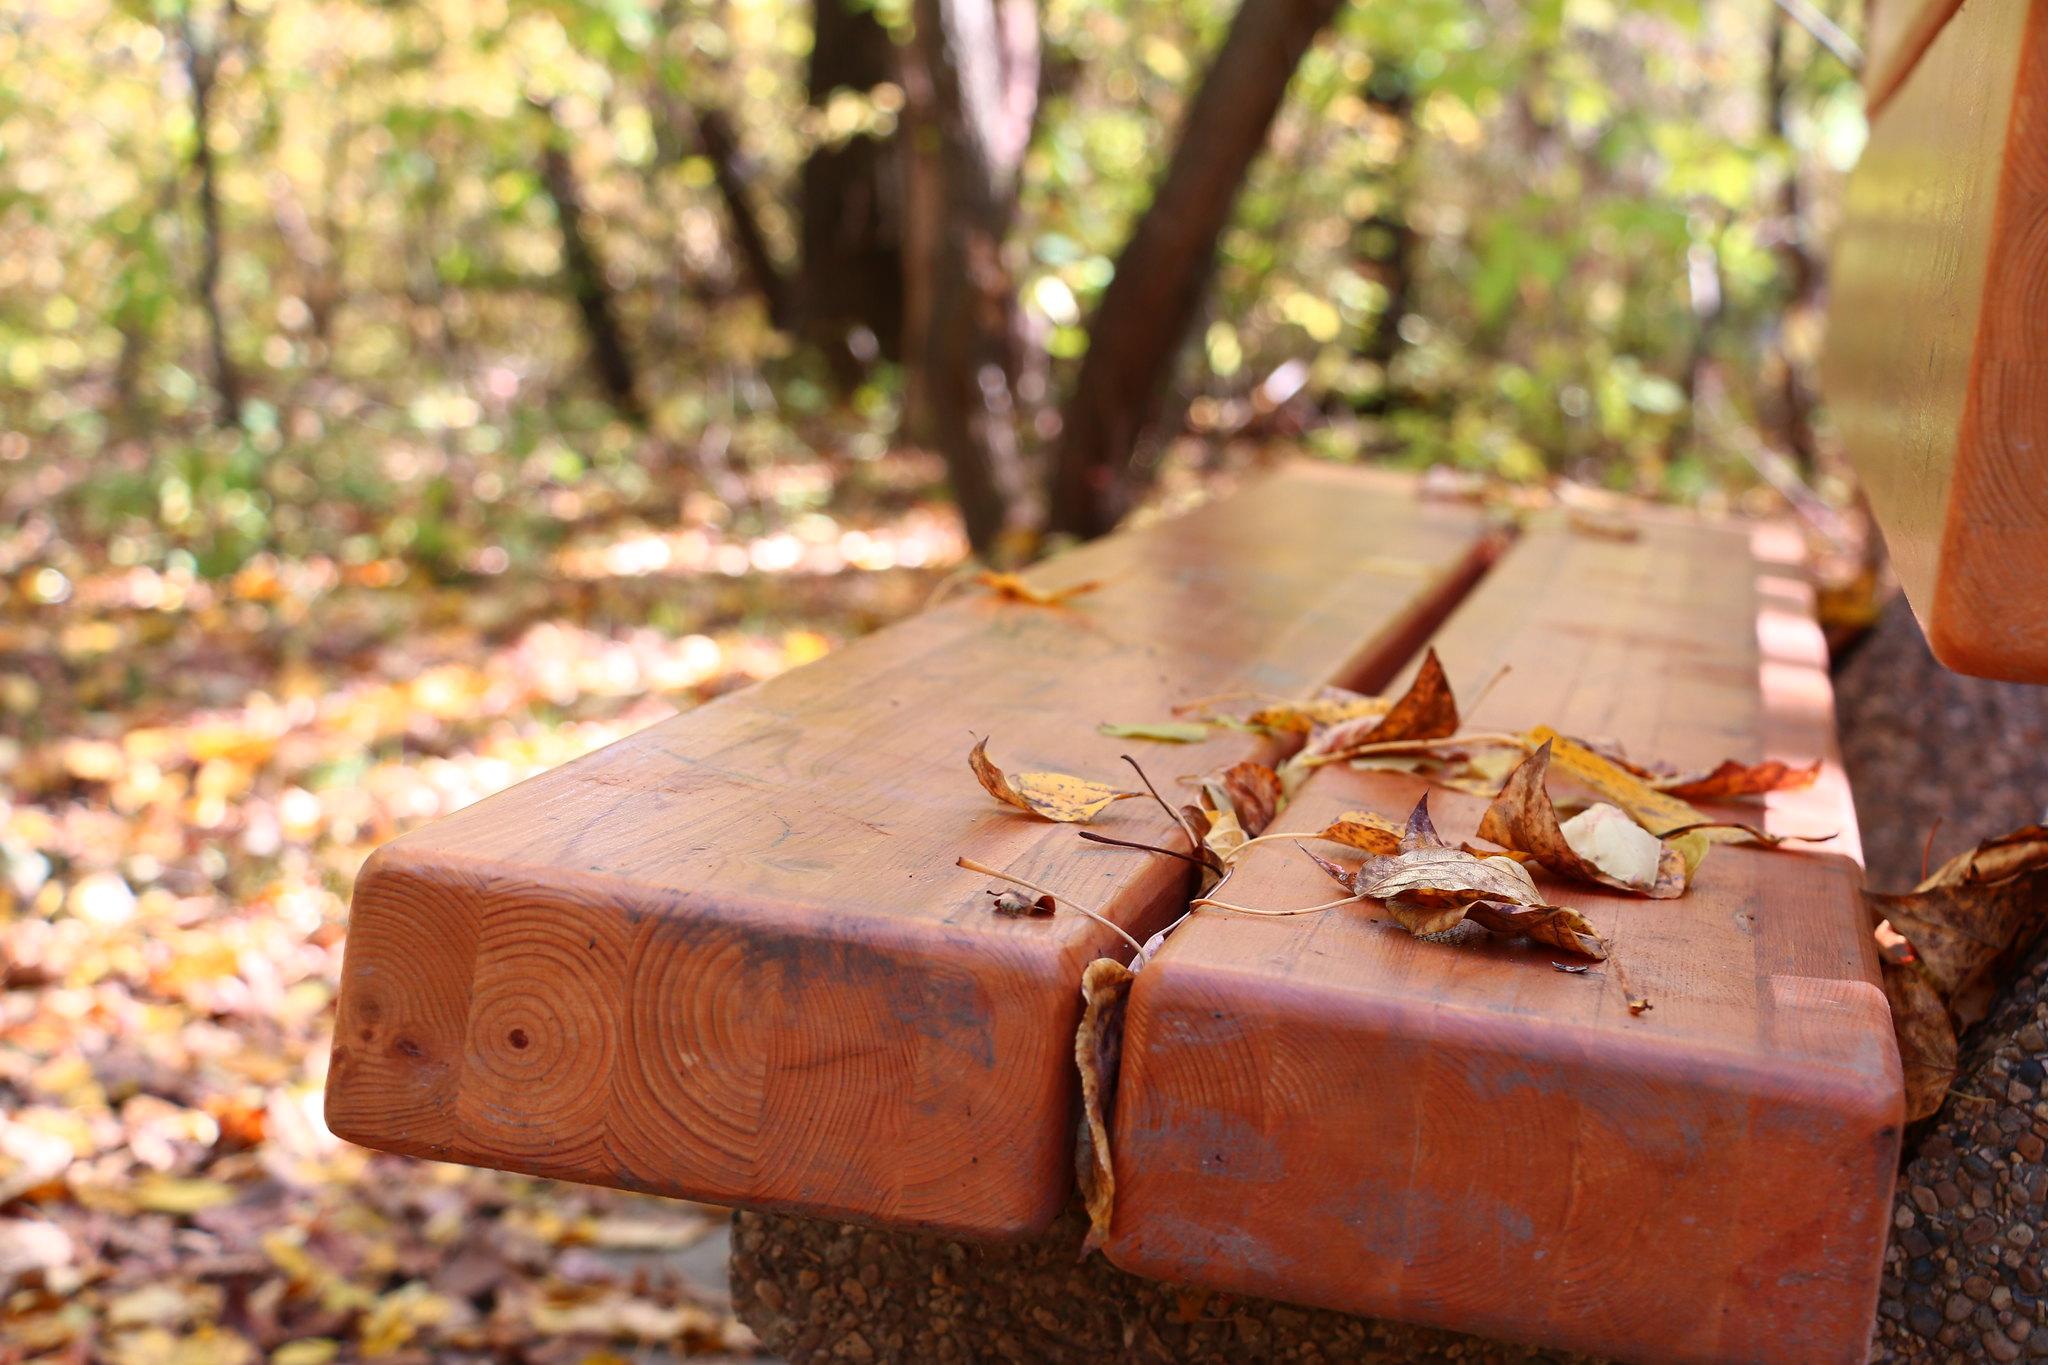 Leaves Left Behind (SOTC 342/365)